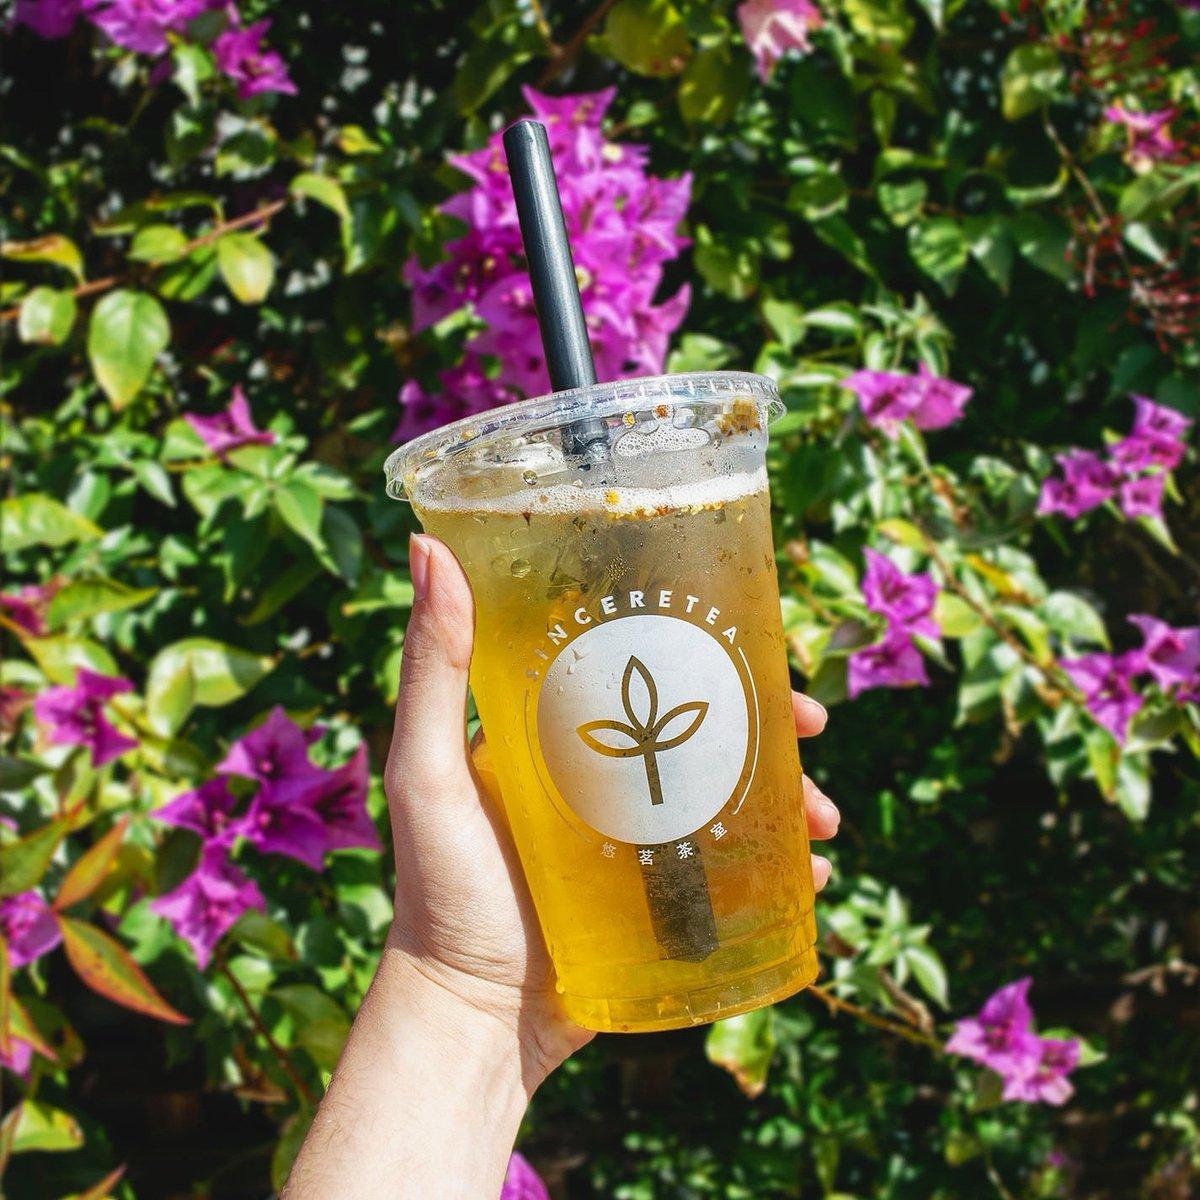 Sunbathe with a Osmanthus Lychee tea in your hand.  . . #tea #yellow #happinessinacup #sunshine #spring #march #fruit #teaaddict #teashop #milktea #boba #bobamilktea #pretty #osmanthus #lychee #refreshing #floral #sinceretea #specialtea #downtownsj #downtownwalnutcreekpic.twitter.com/cXeDbQE7rG